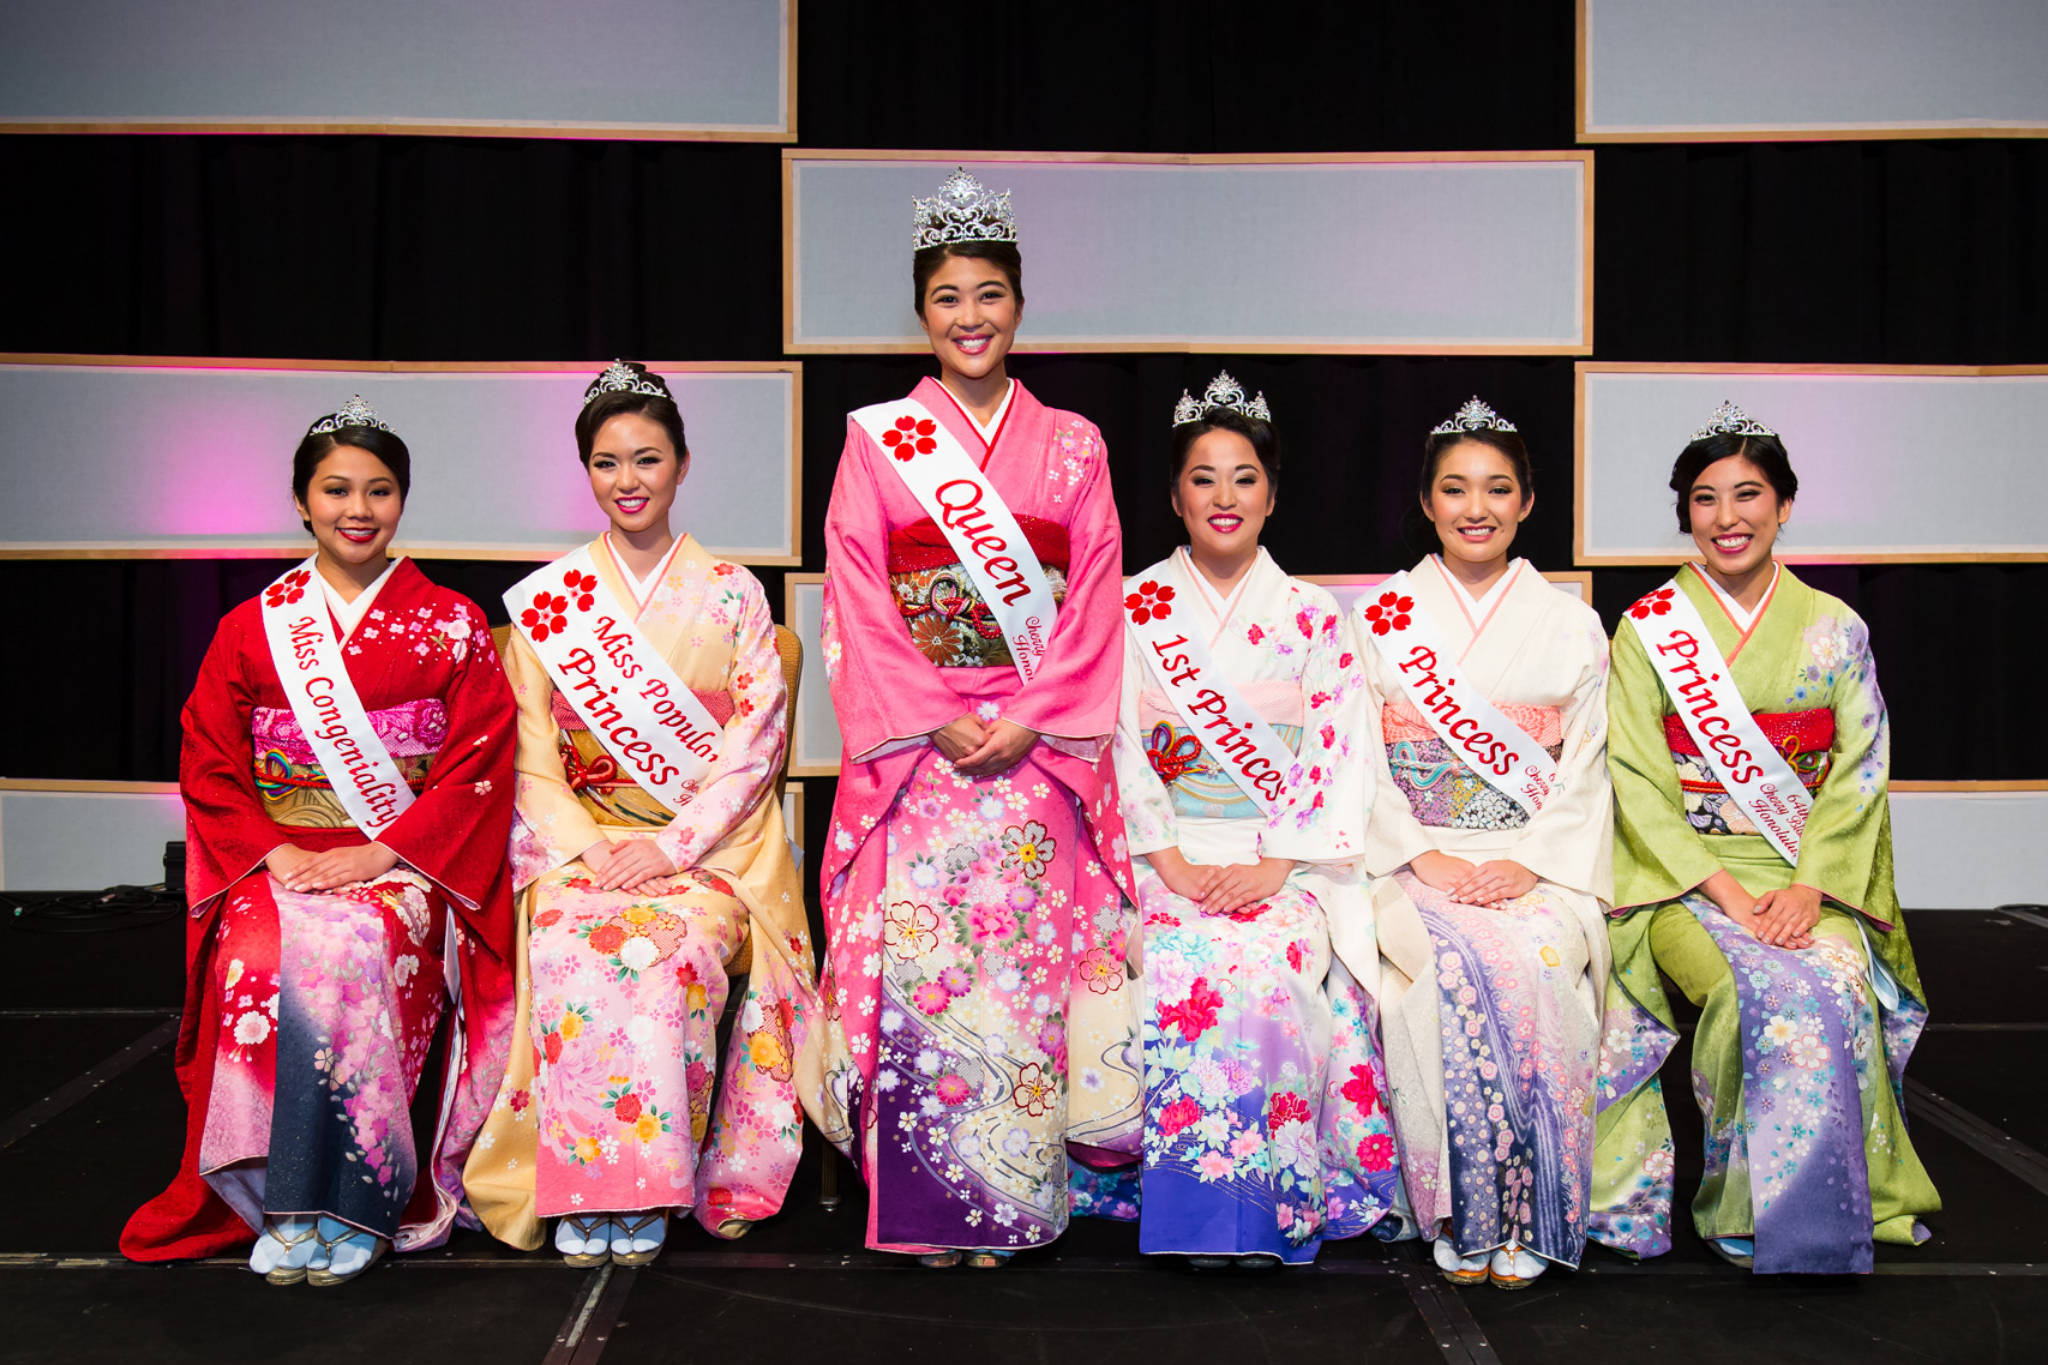 Left to right: Miss Congeniality Dylan Lau, Princess and Miss Popularity Asia Ayabe, Queen Alexis Okihara, 1st Princess Brittney Kawahara, Princess Ritsuko Tomari and Princess Kristi Murakami.